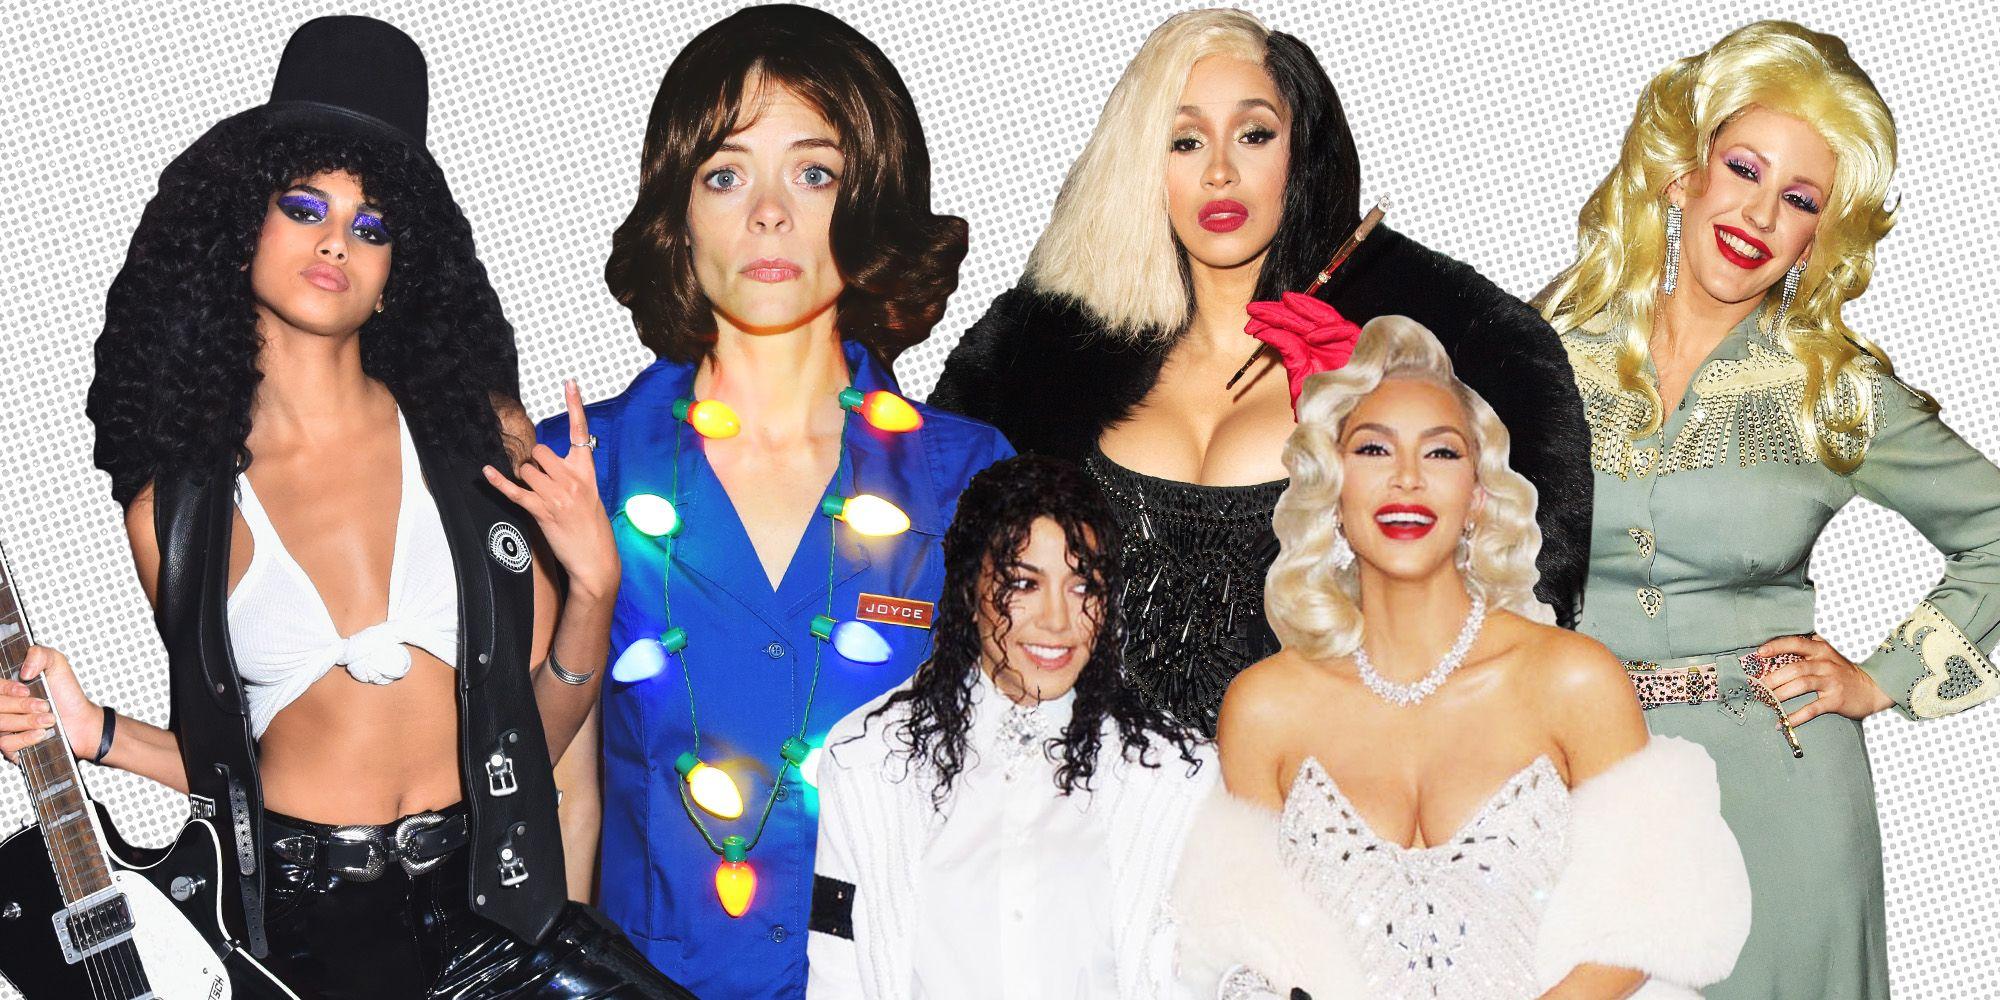 Best Celebrity Halloween Costumes 2017 - What Celebrities Wore This Halloween  sc 1 st  Elle & Best Celebrity Halloween Costumes 2017 - What Celebrities Wore This ...